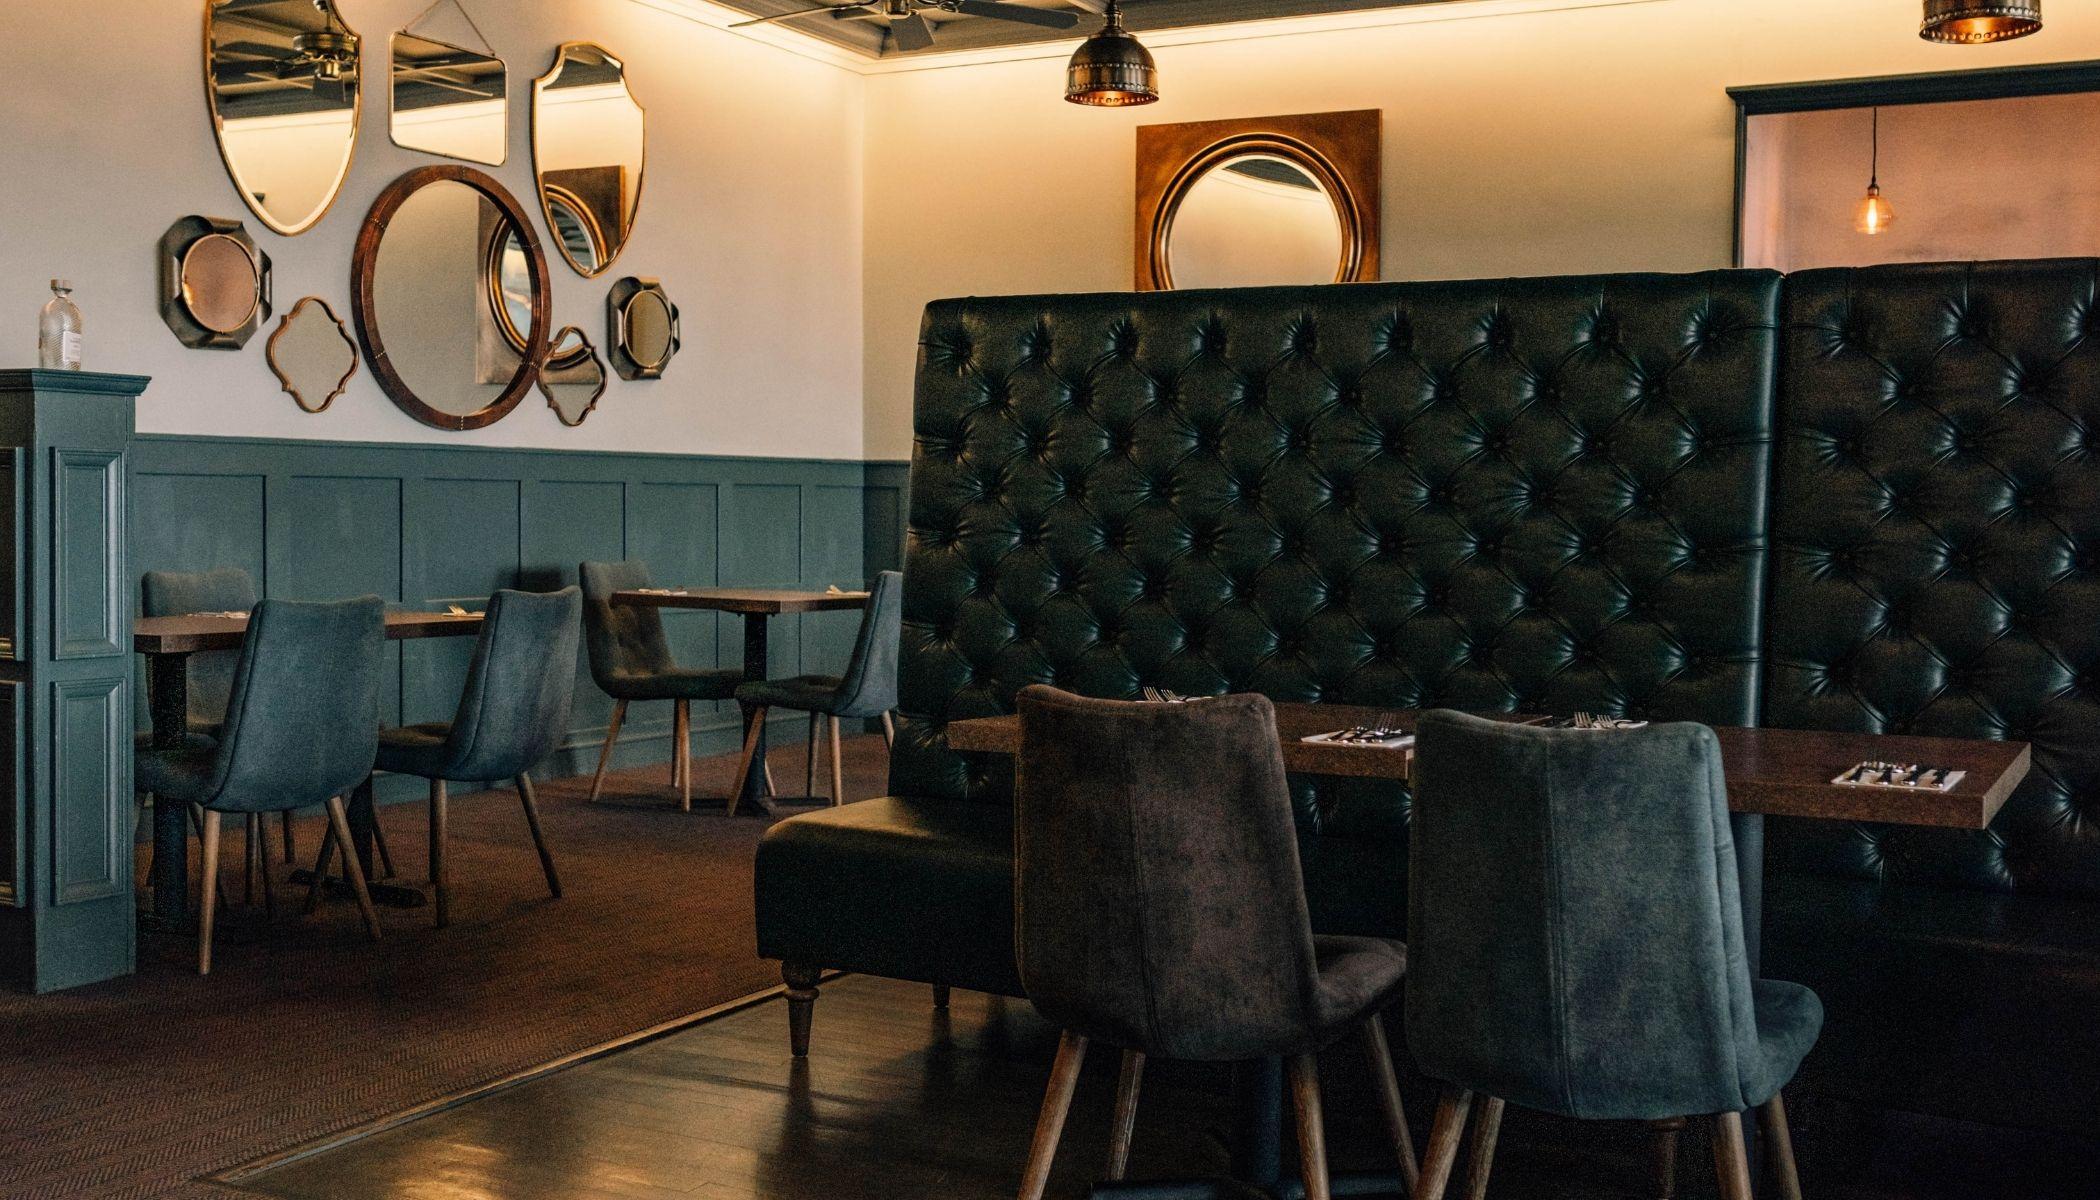 Waterside Dining at The Kirkwall Hotel